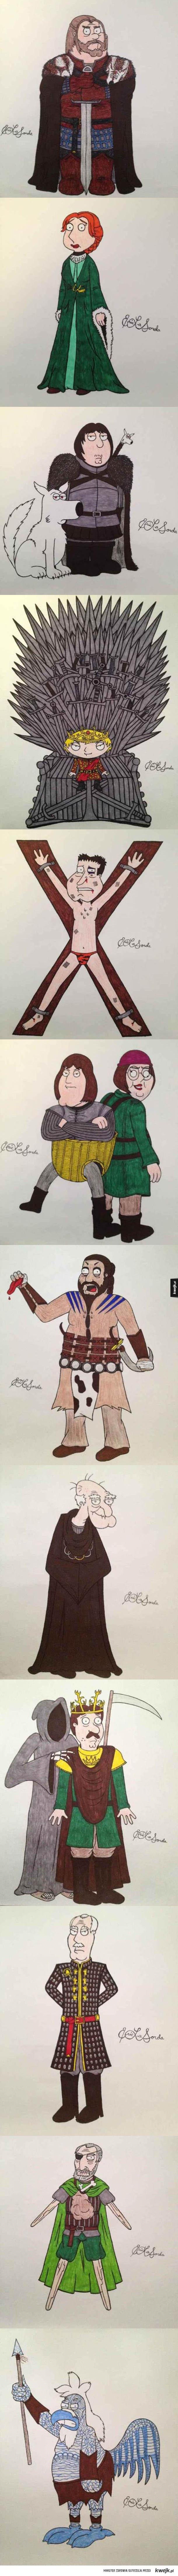 Family Guy z Westeros - family guy, gra o tron, westeros